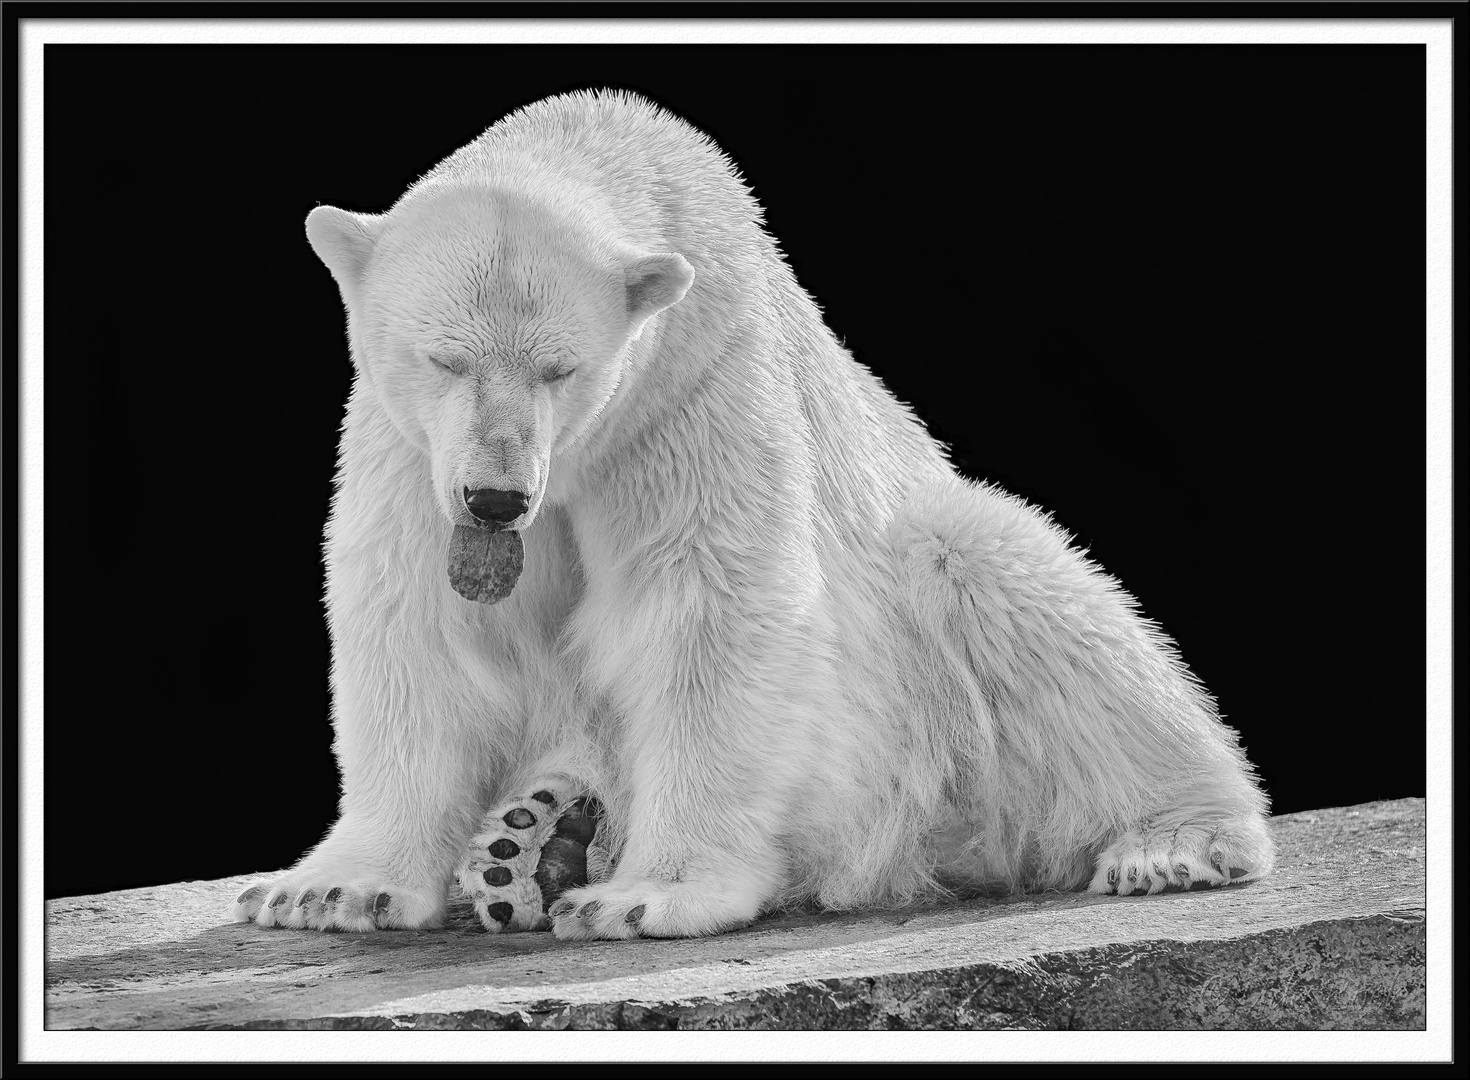 Eisbär, gelangweilt